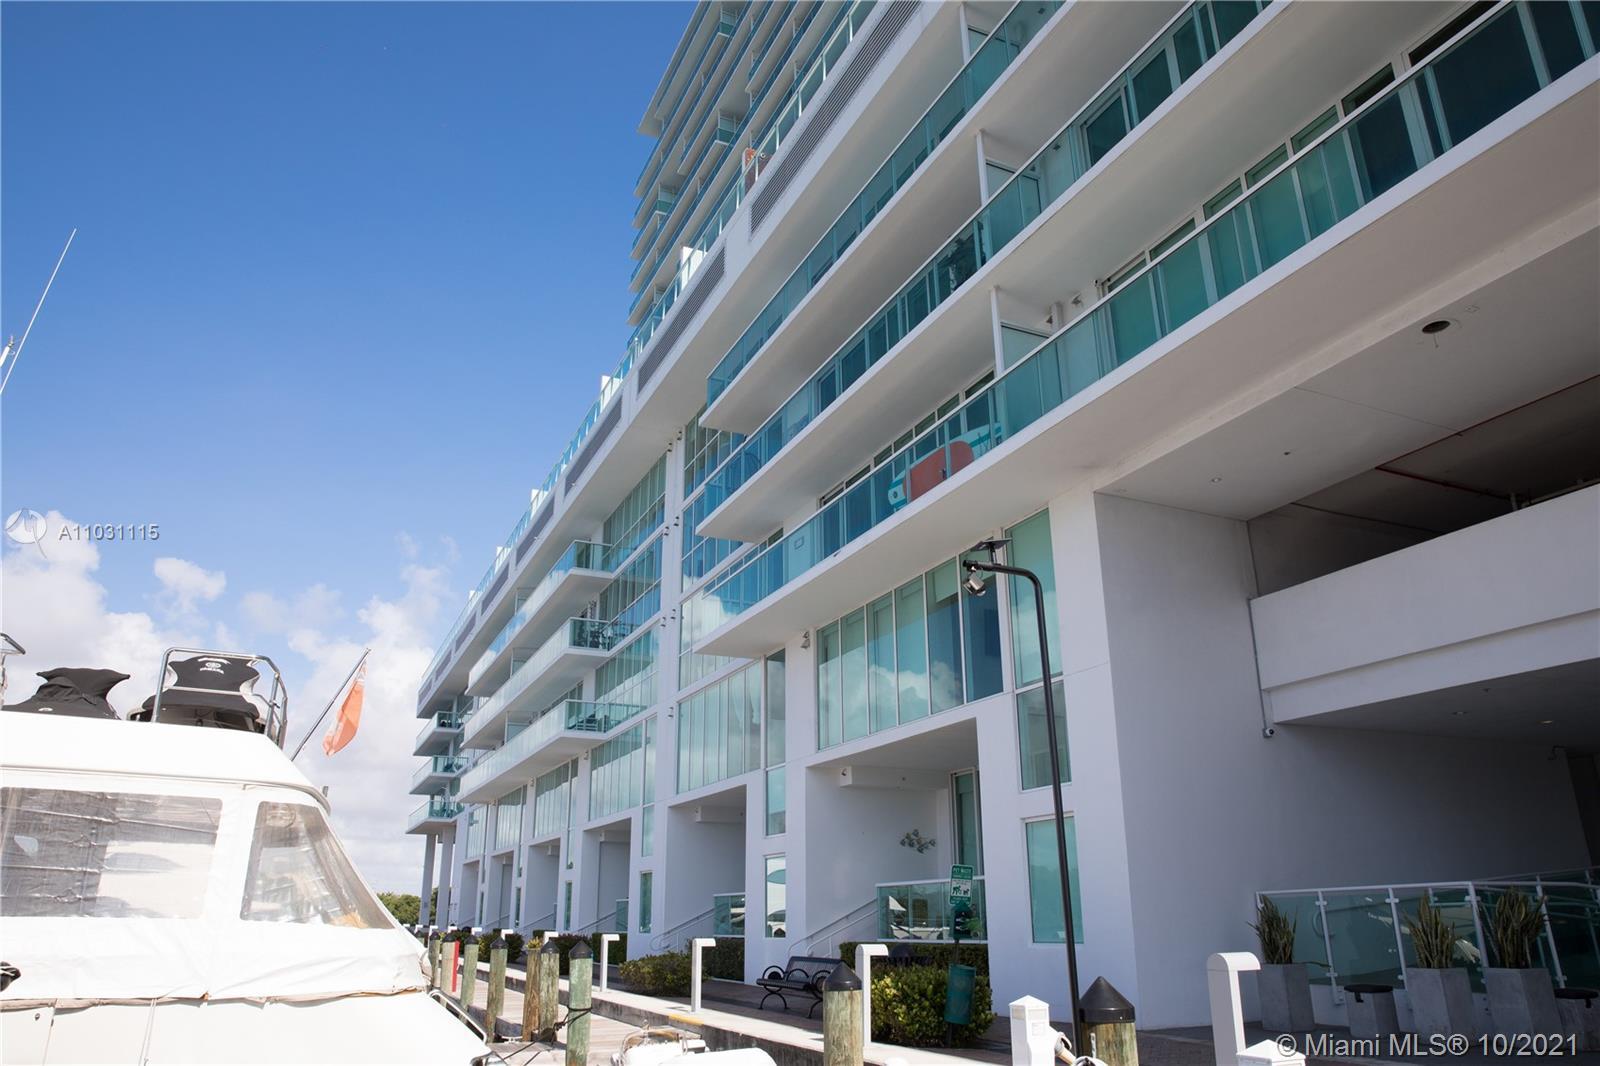 400 Sunny Isles #1701 - 400 Sunny Isles Blvd #1701, Sunny Isles Beach, FL 33160